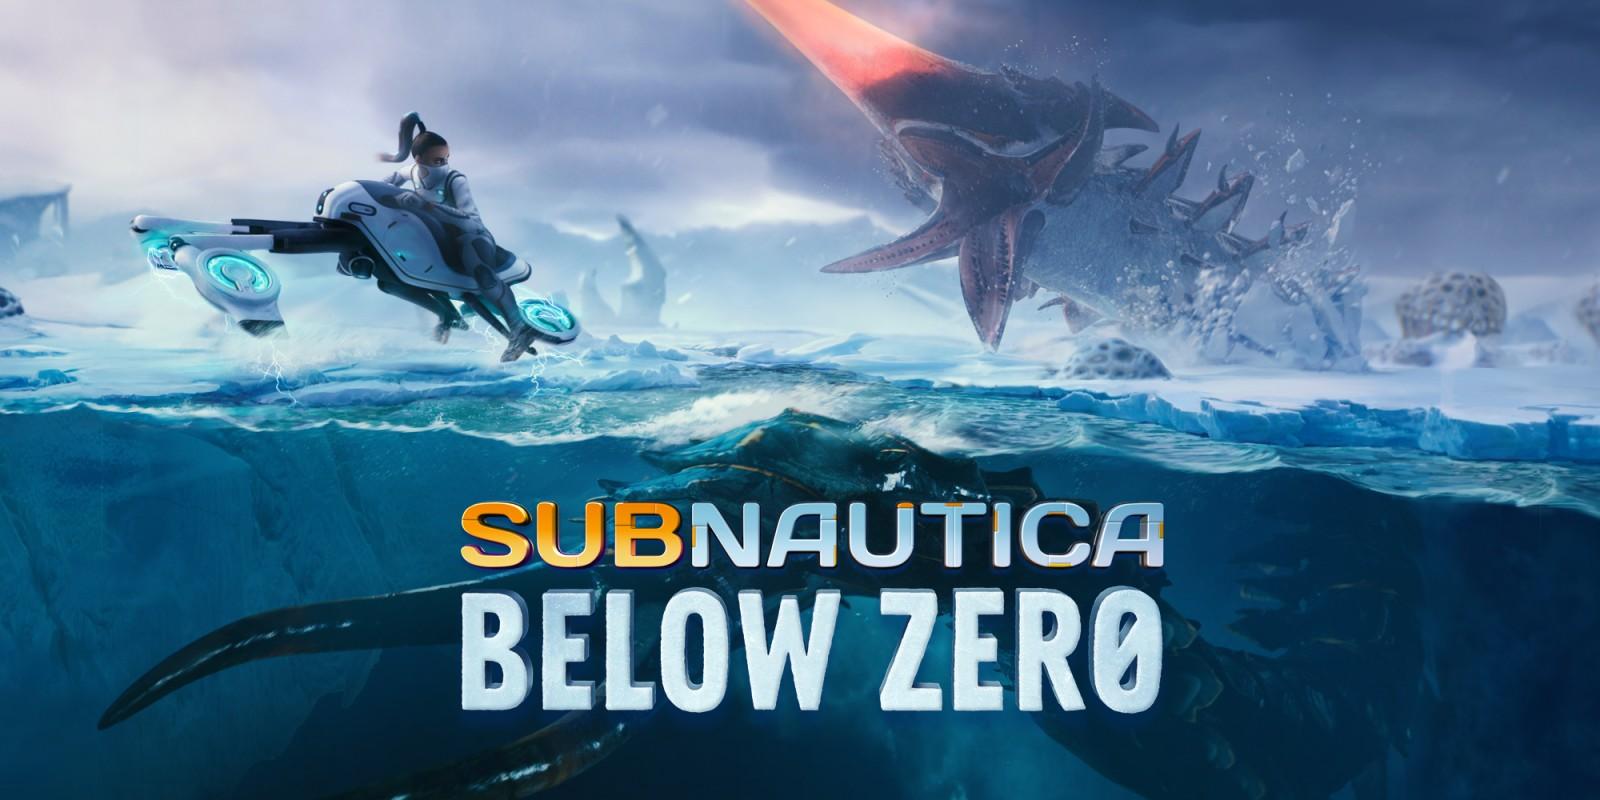 Subnautica: Below Zero (Image Credits: unknownworlds)